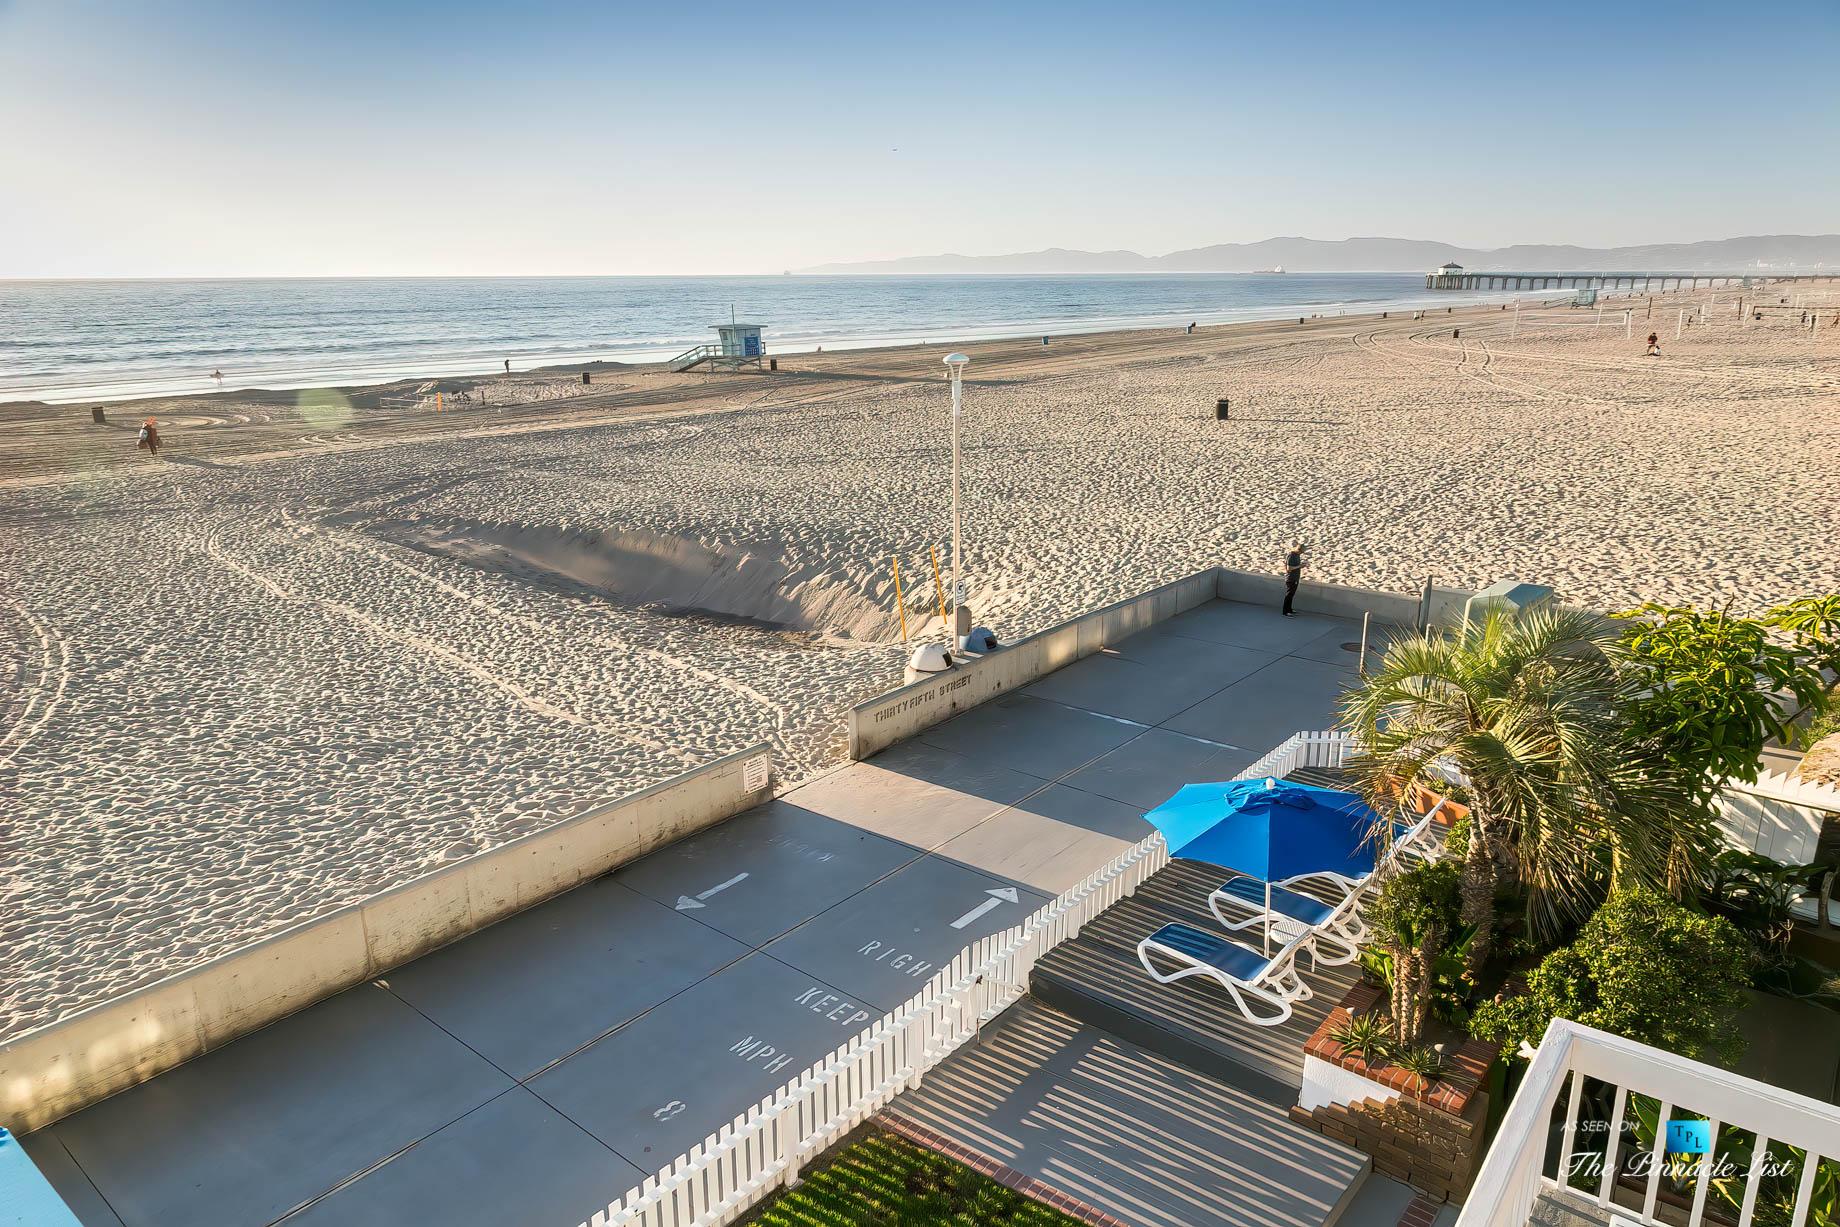 3500 The Strand, Hermosa Beach, CA, USA – Deck Beach View – Luxury Real Estate – Original 90210 Beach House